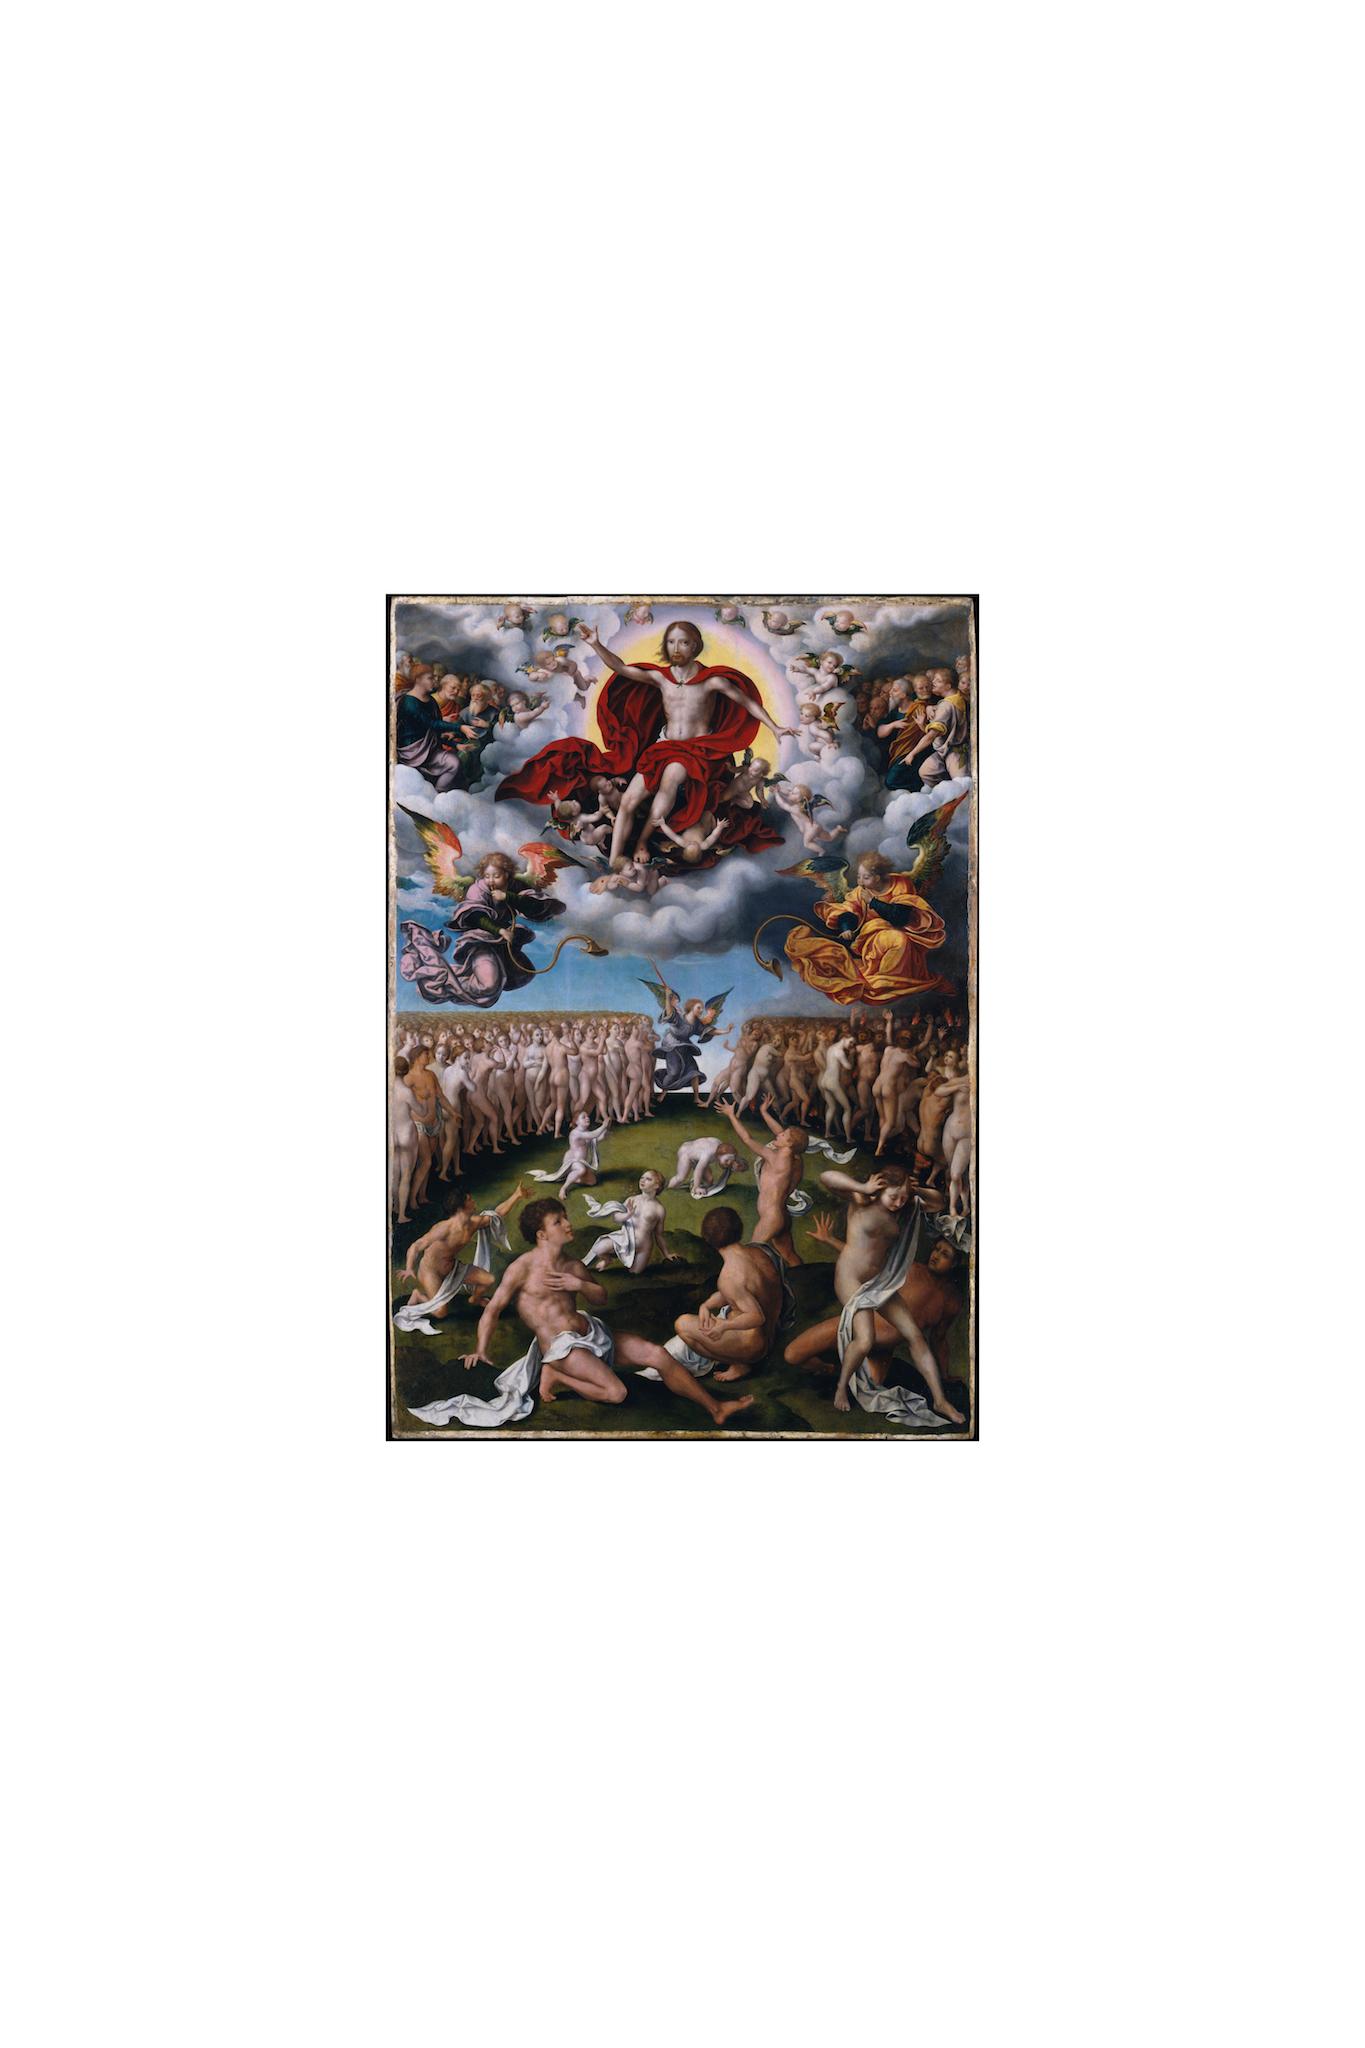 Joos van Cleve, The Last Judgment, ca. 1520–25